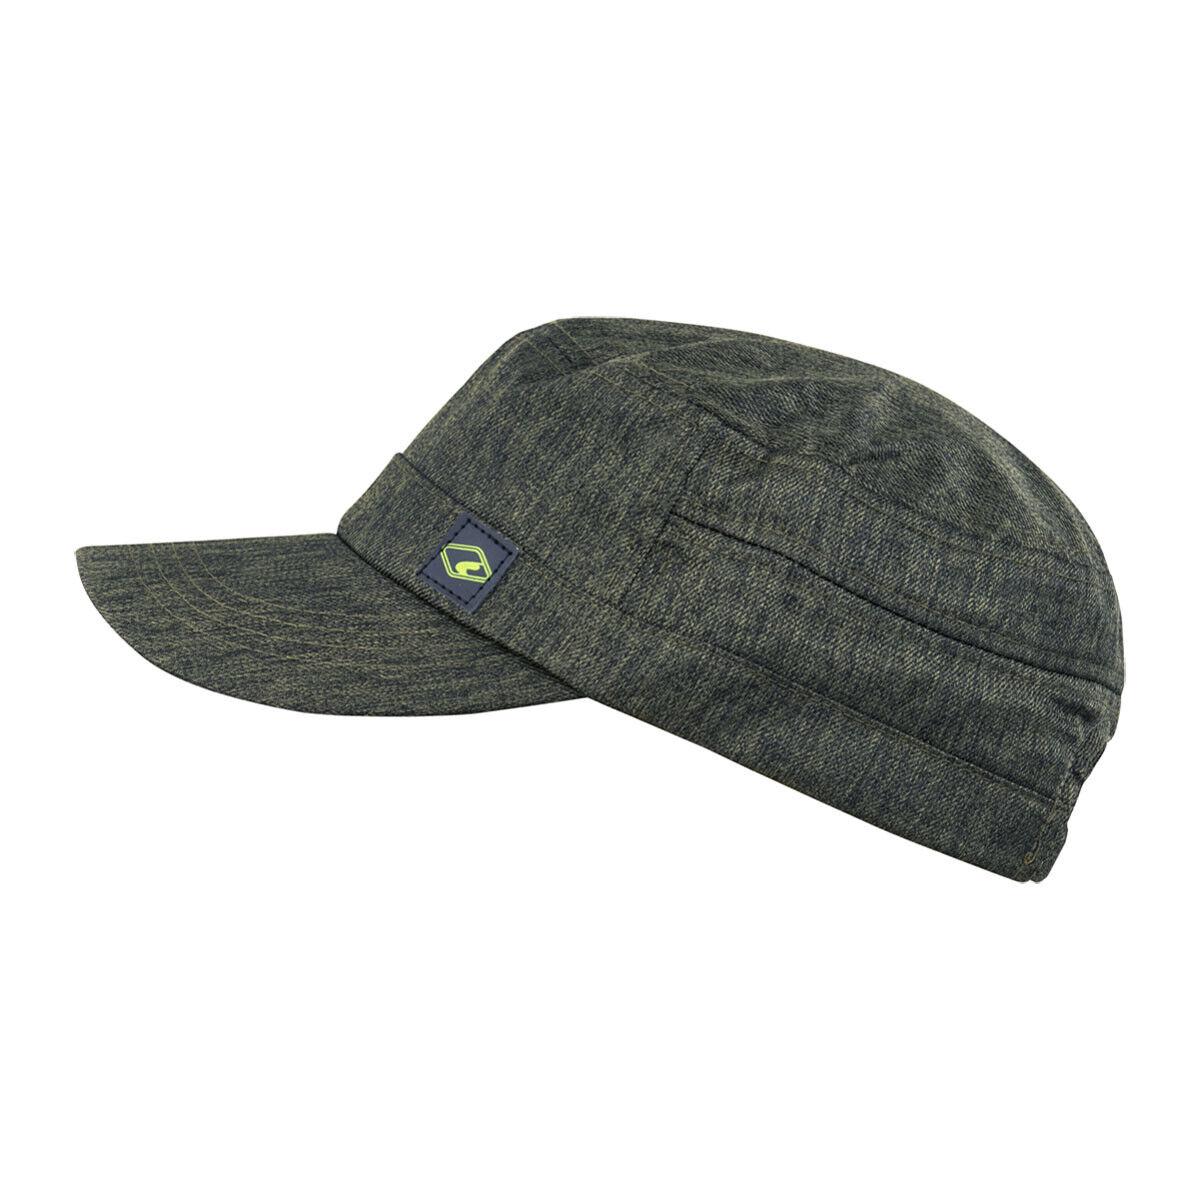 CHILLOUTS San Sebastian Hat in Olive Herren Mütze | Army Cap | Schirmmütze